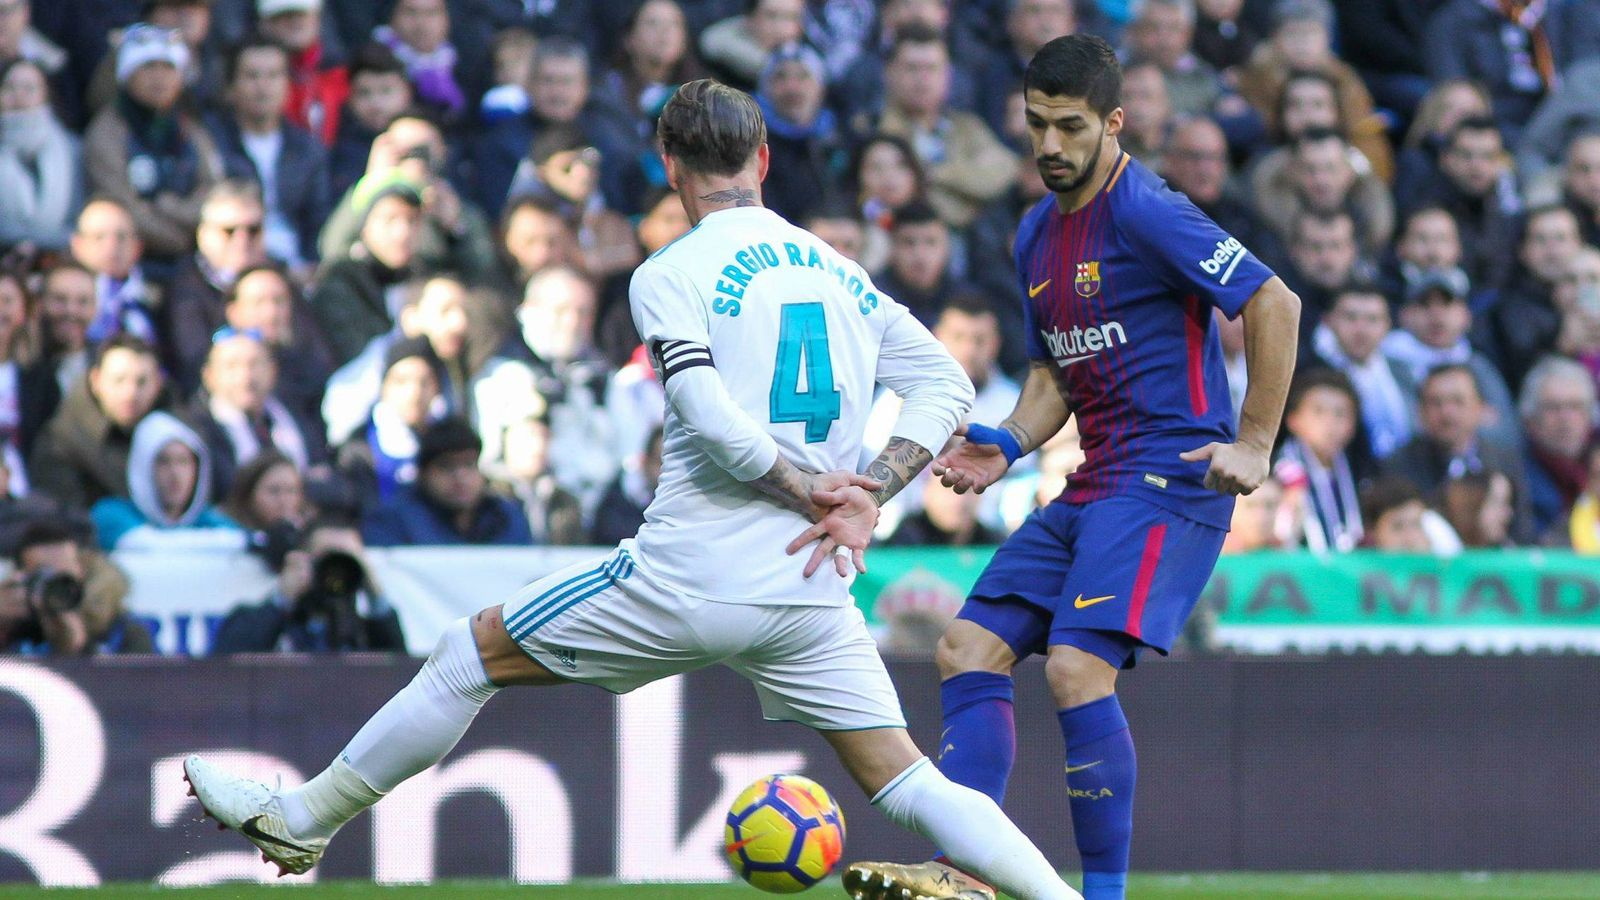 Foto: Sergio Ramos ante Luis Suárez. (Cordon Press)